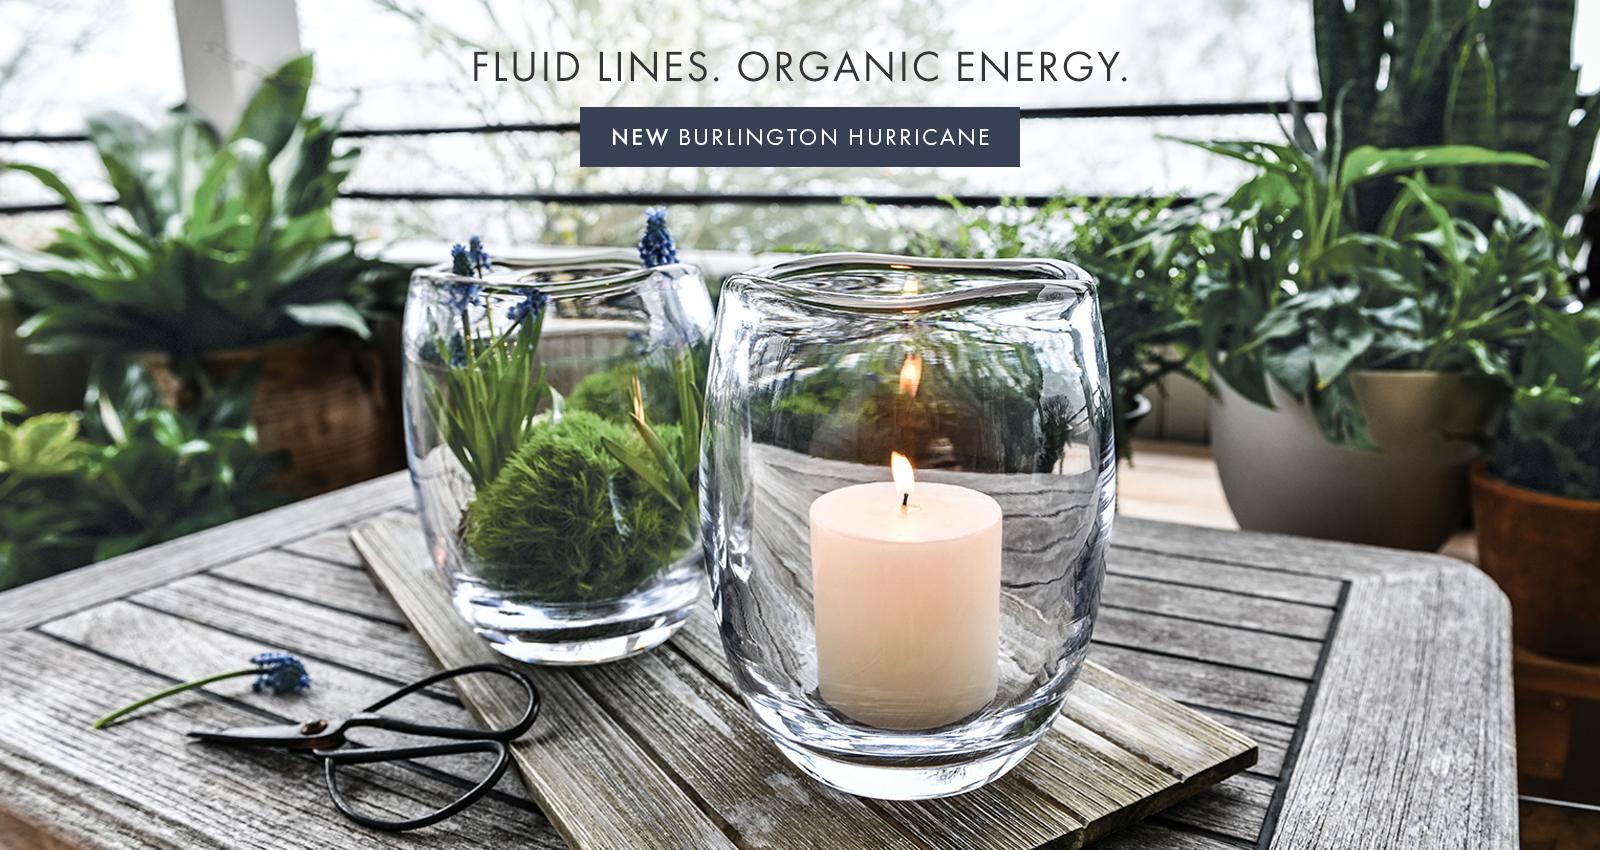 LUID LINES. ORGANIC ENERGY — NEW BURLINGTON HURRICANE >